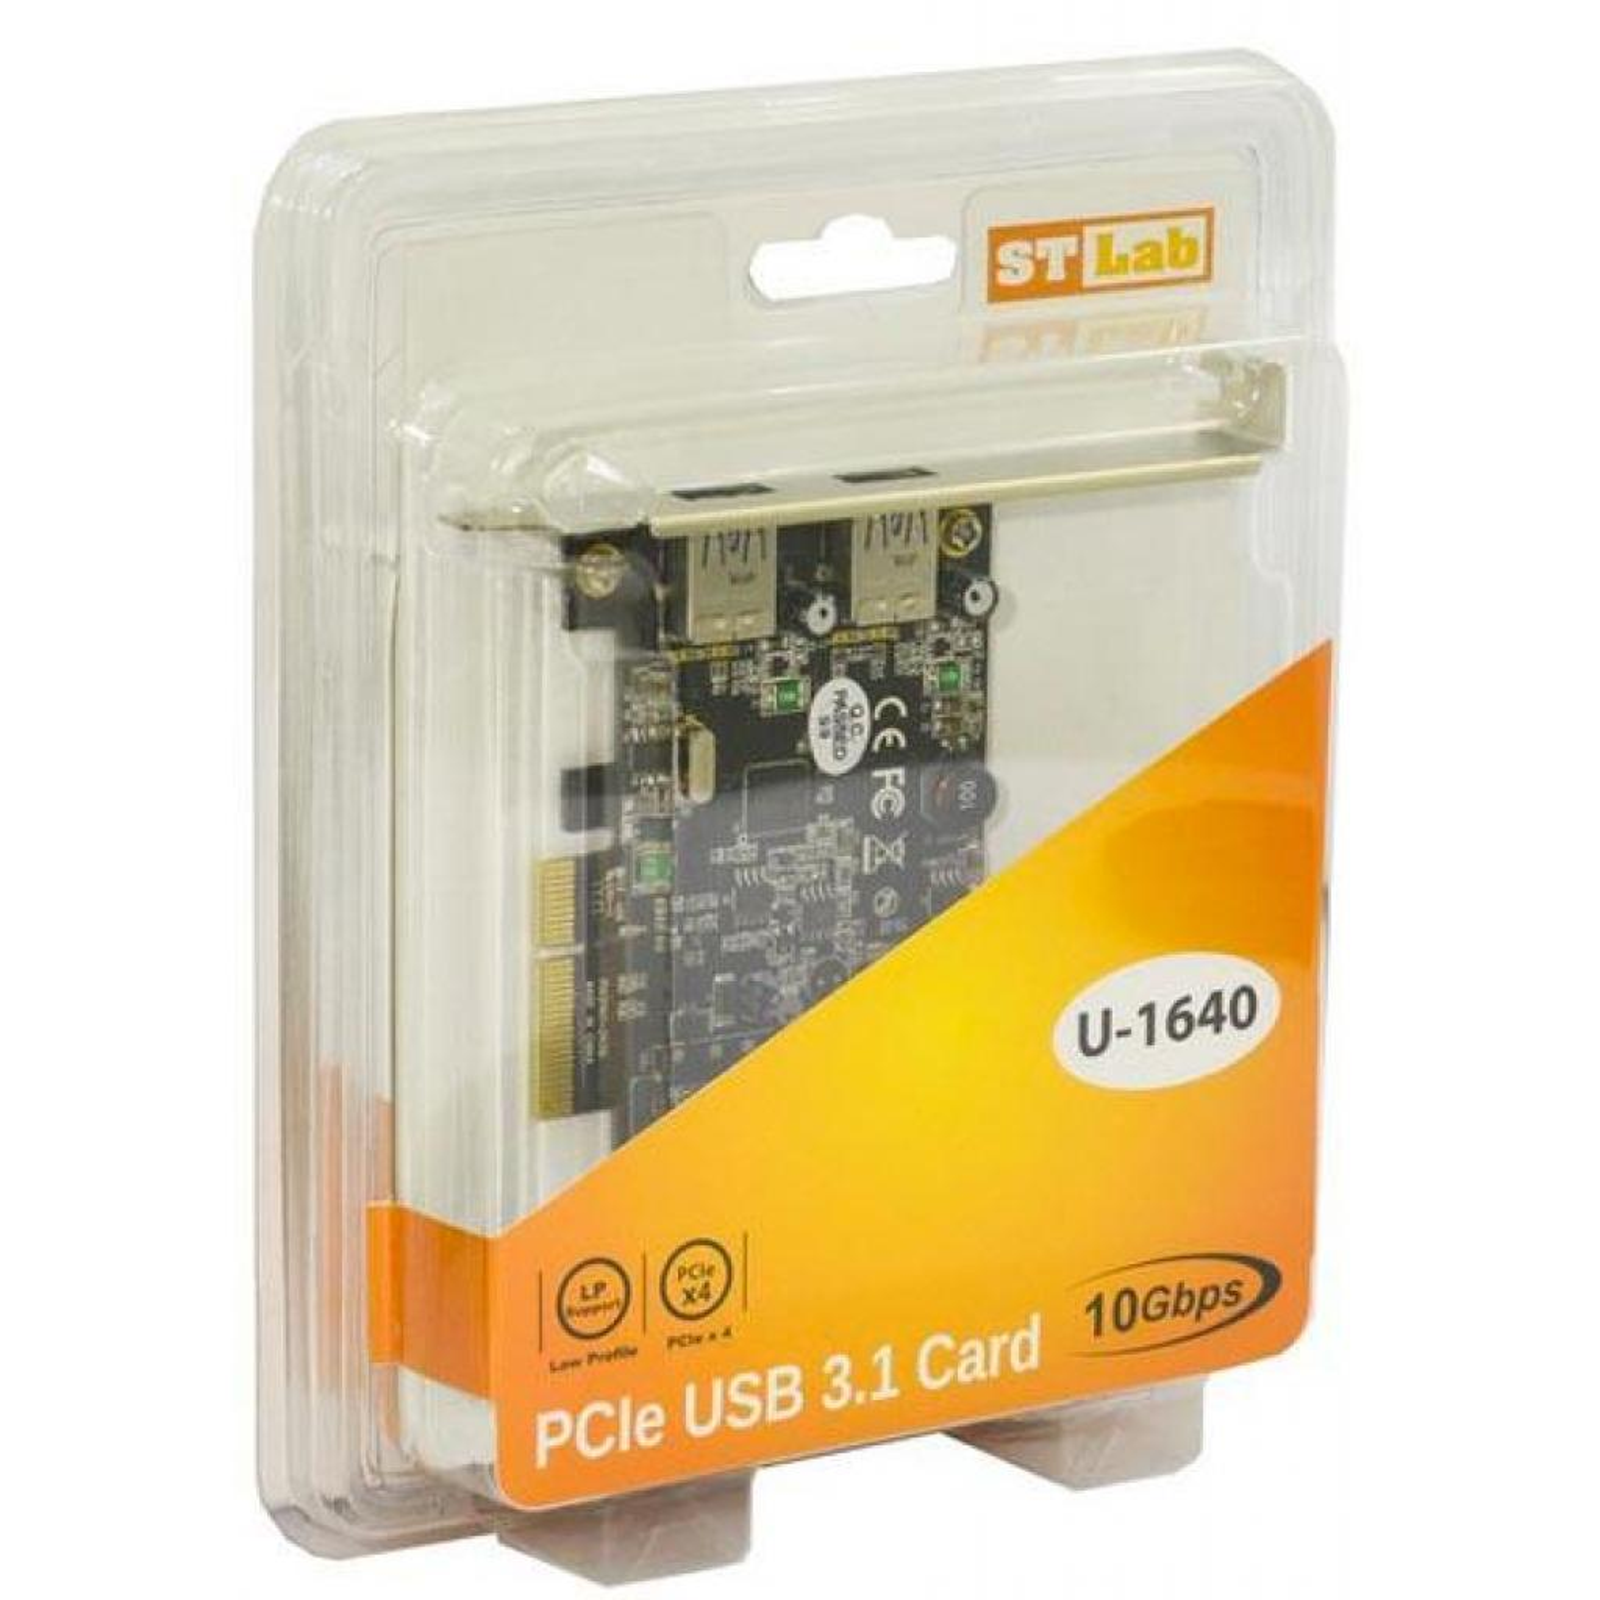 Контроллер PCI to USB3.1 Gen2 2xType-A PCI-E Gen-III x2+планка Low Prof ST-Lab (U-1640) изображение 7